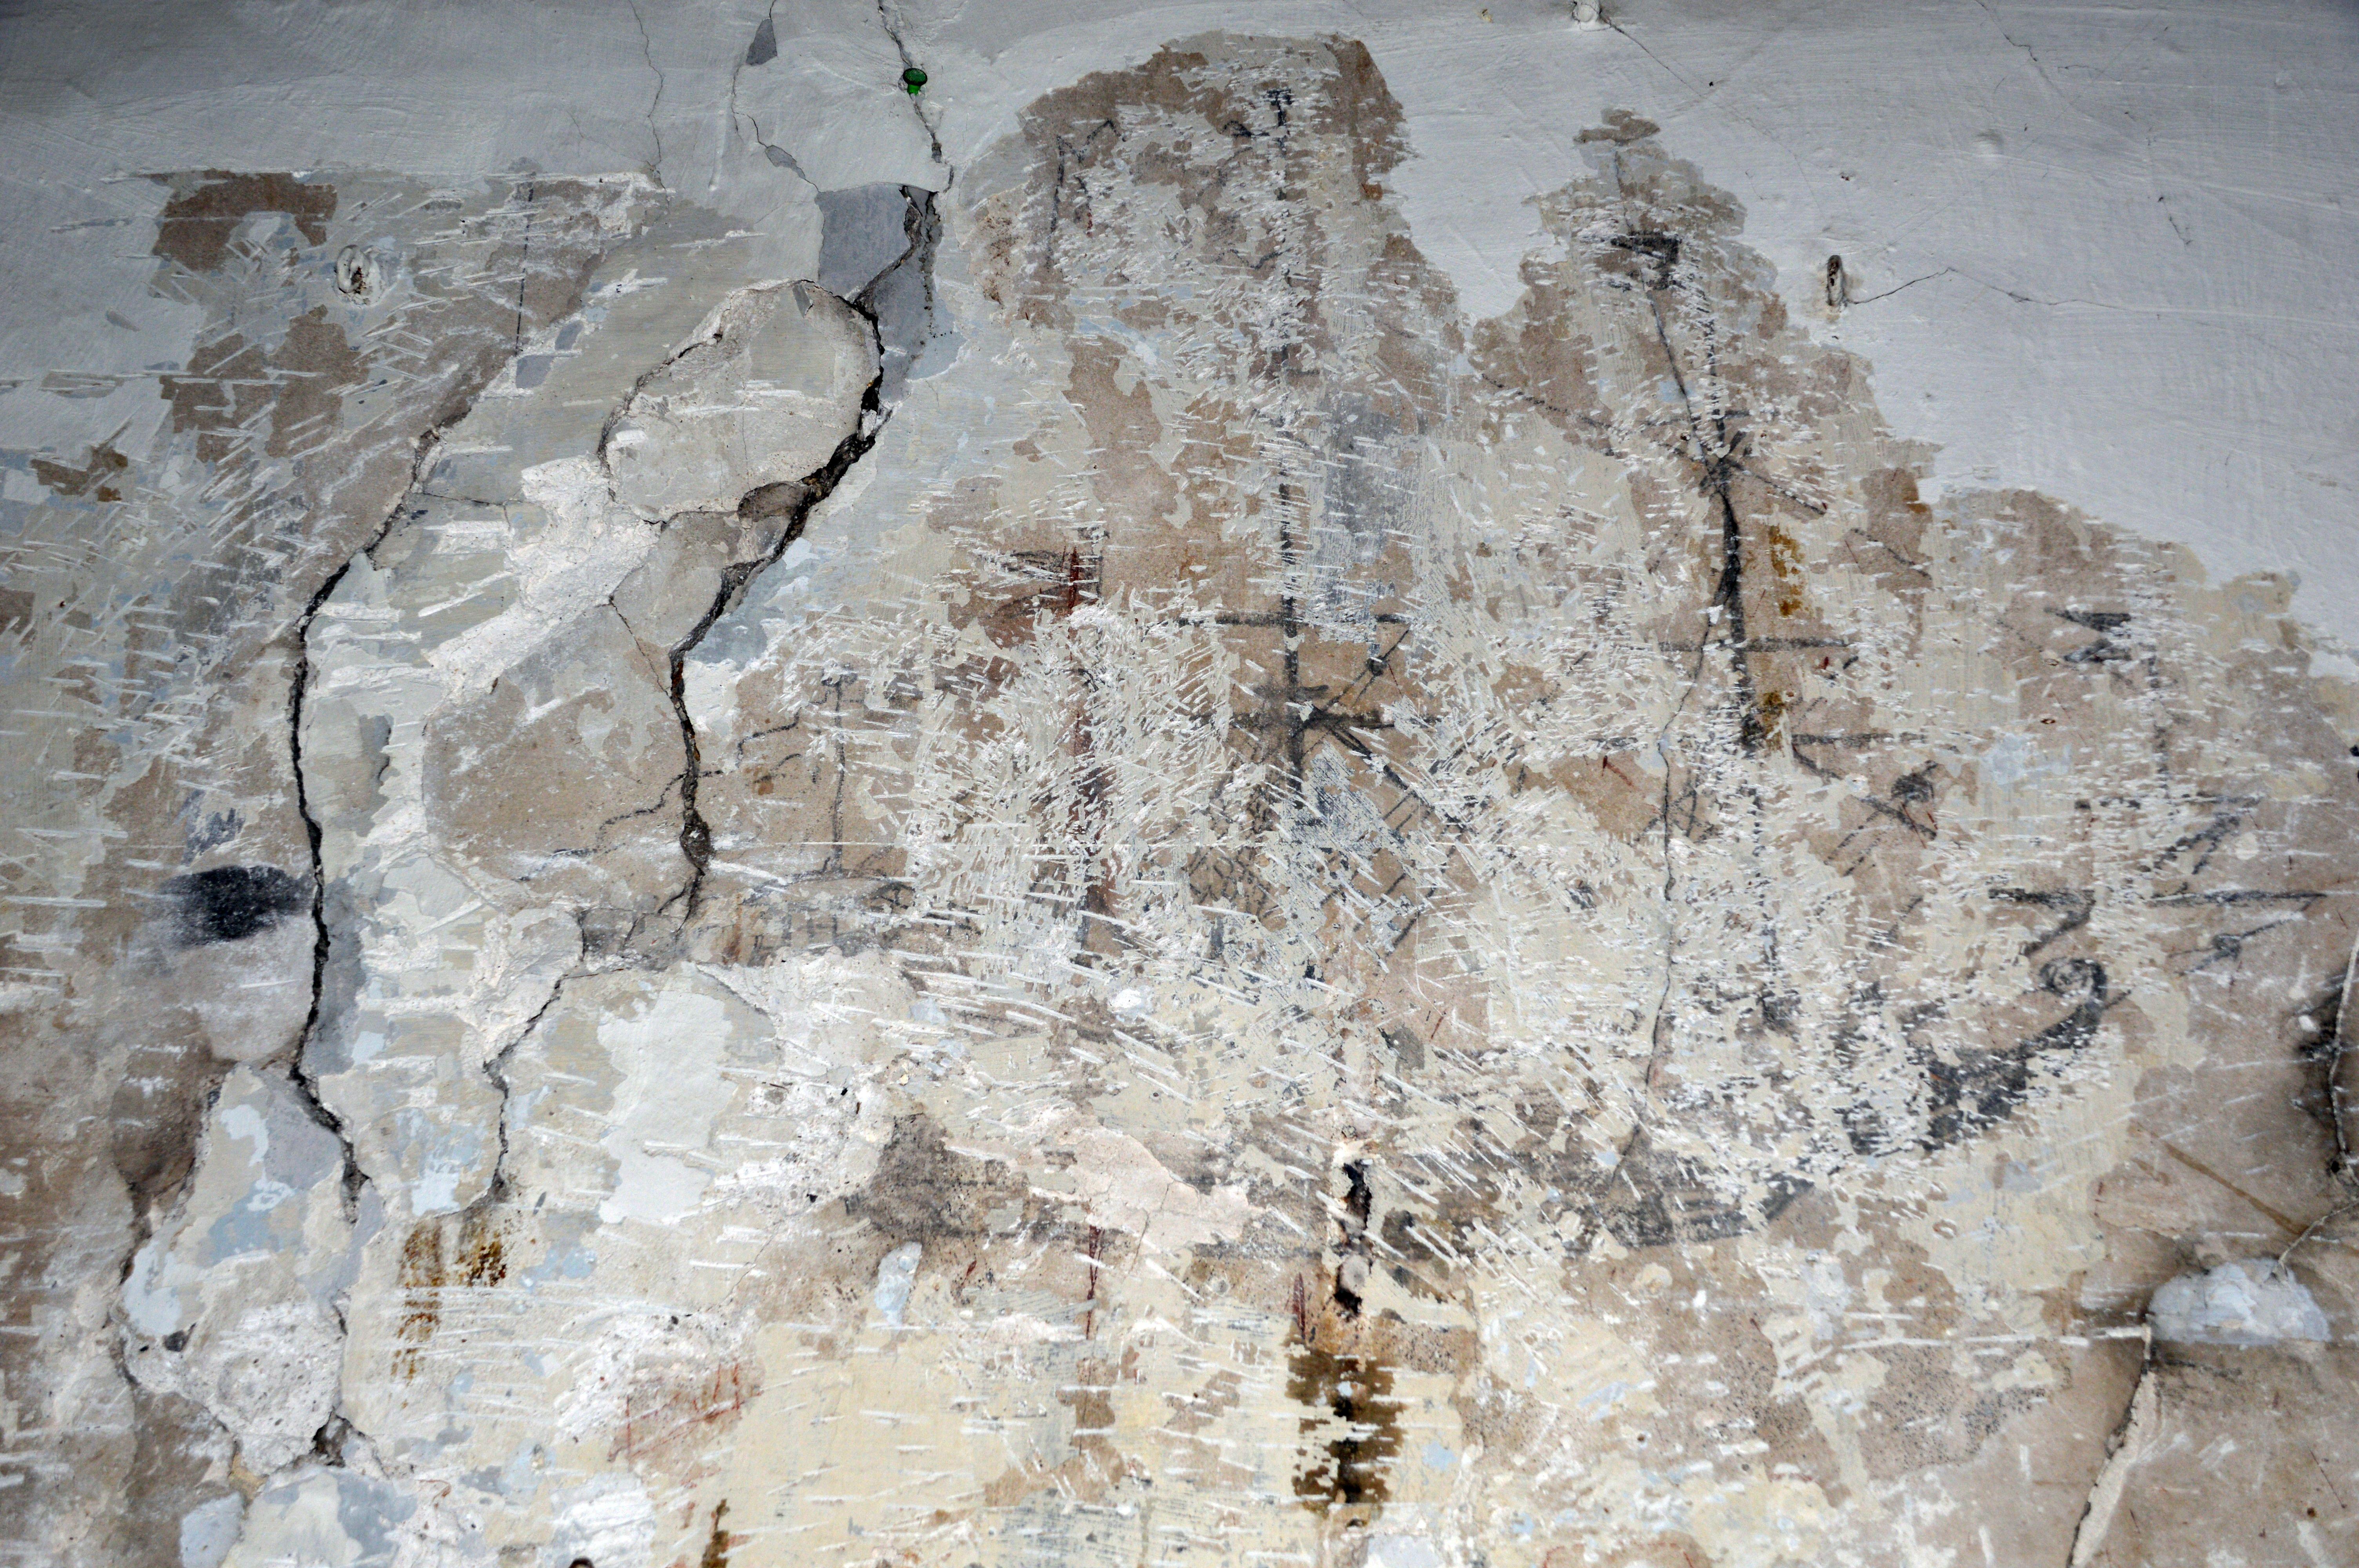 Graffiti en hébreu gravé dans l'enduit